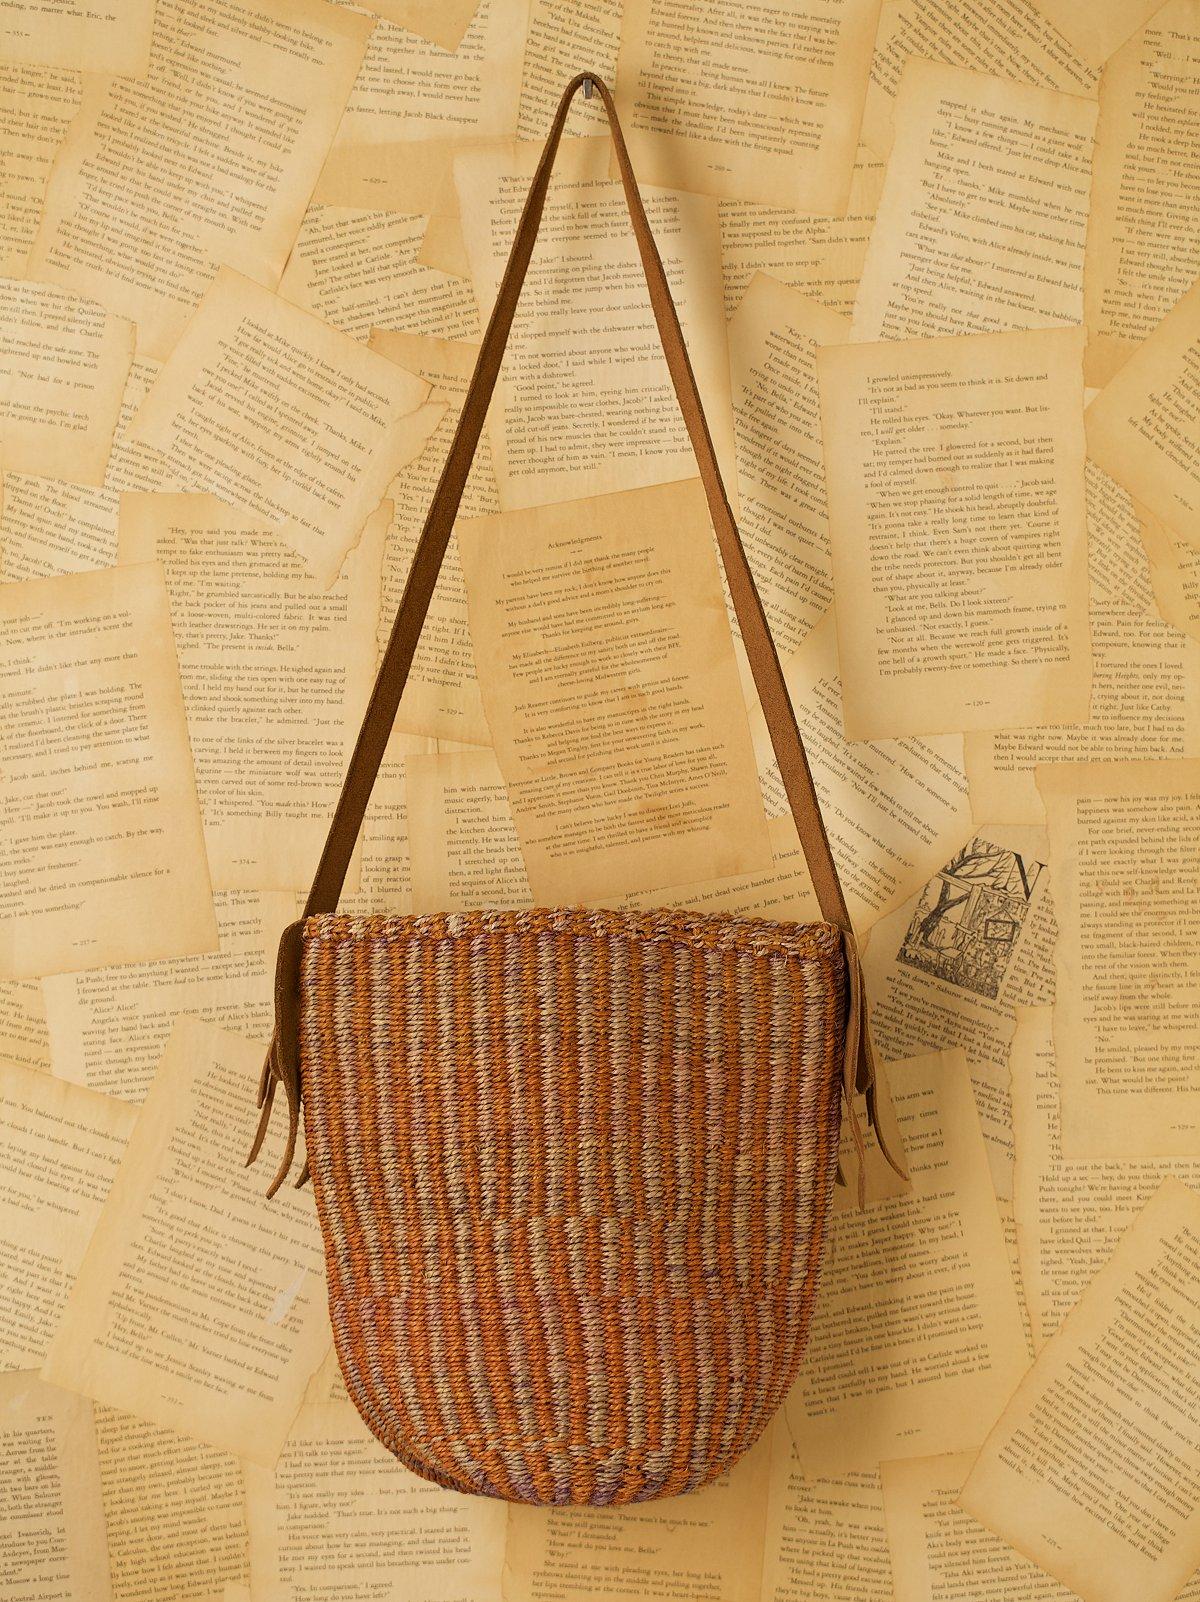 Vintage Woven Straw Market Bag